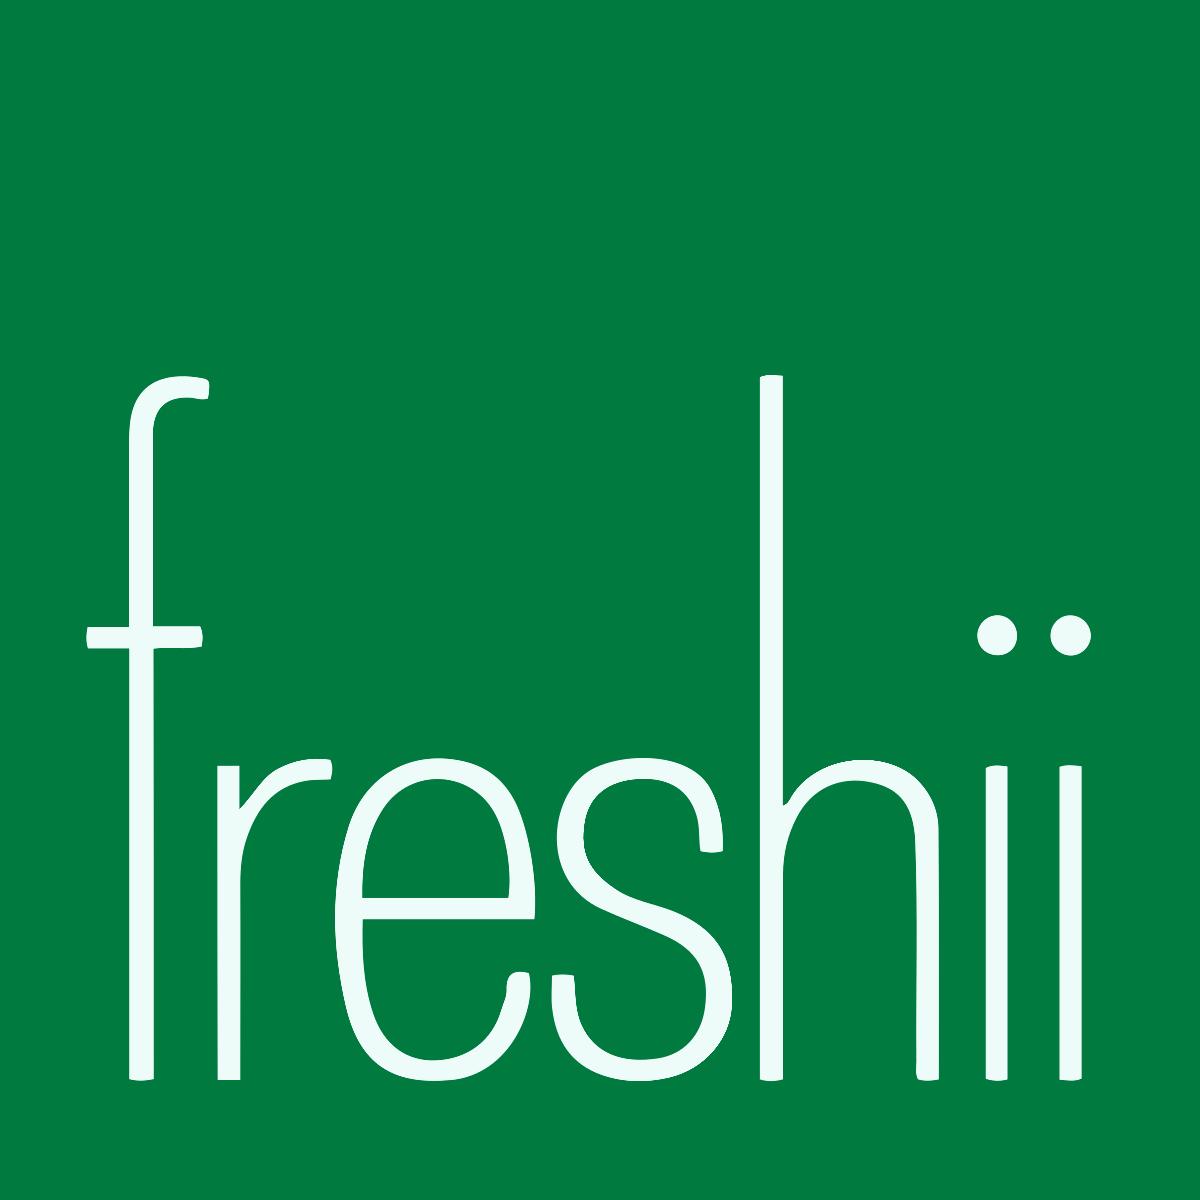 logo of Freshii